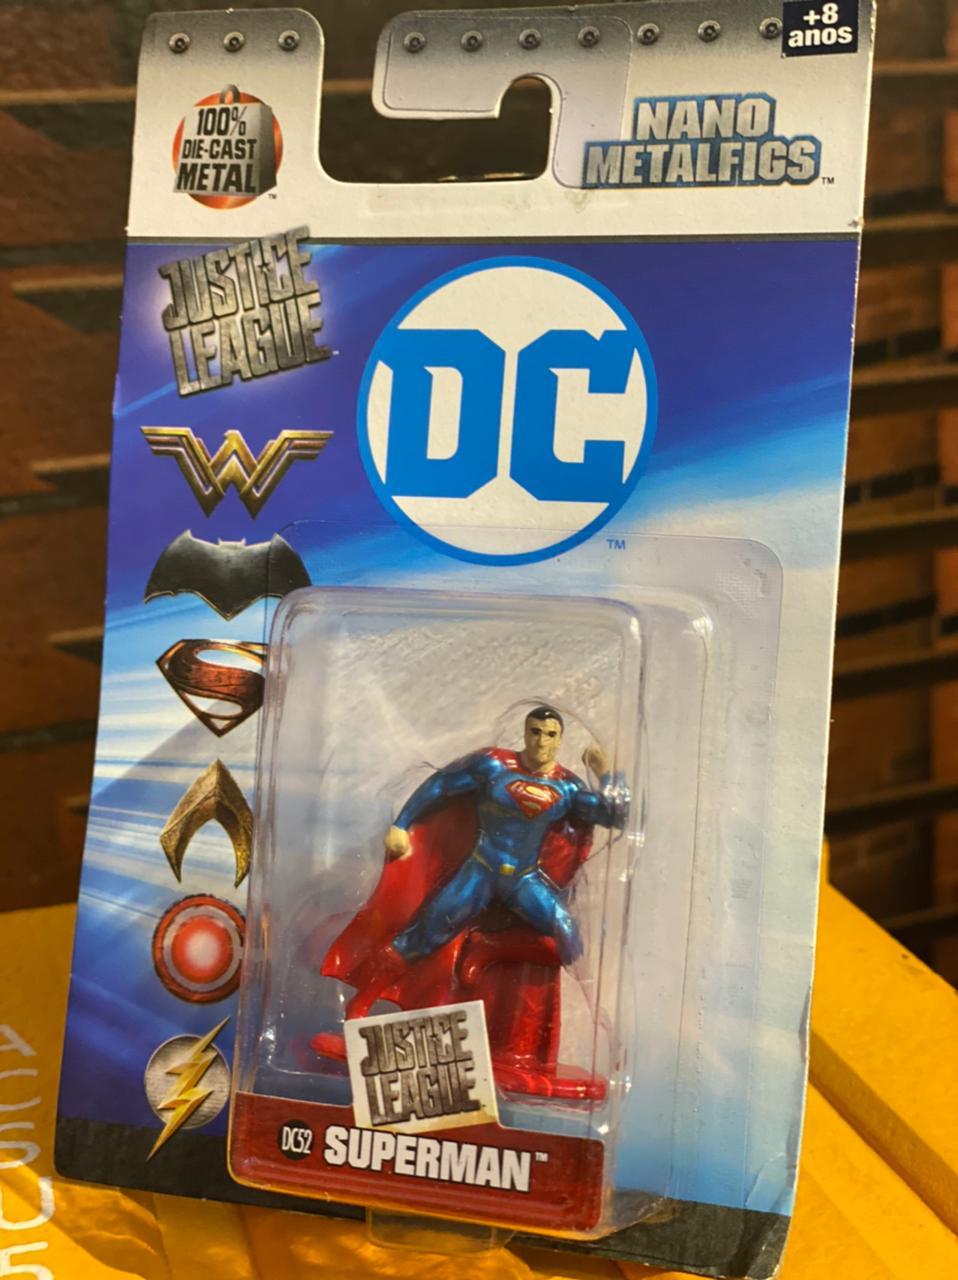 Nano Metalfigs Super-Homem (Superman): DC Comics (DC52) - DTC